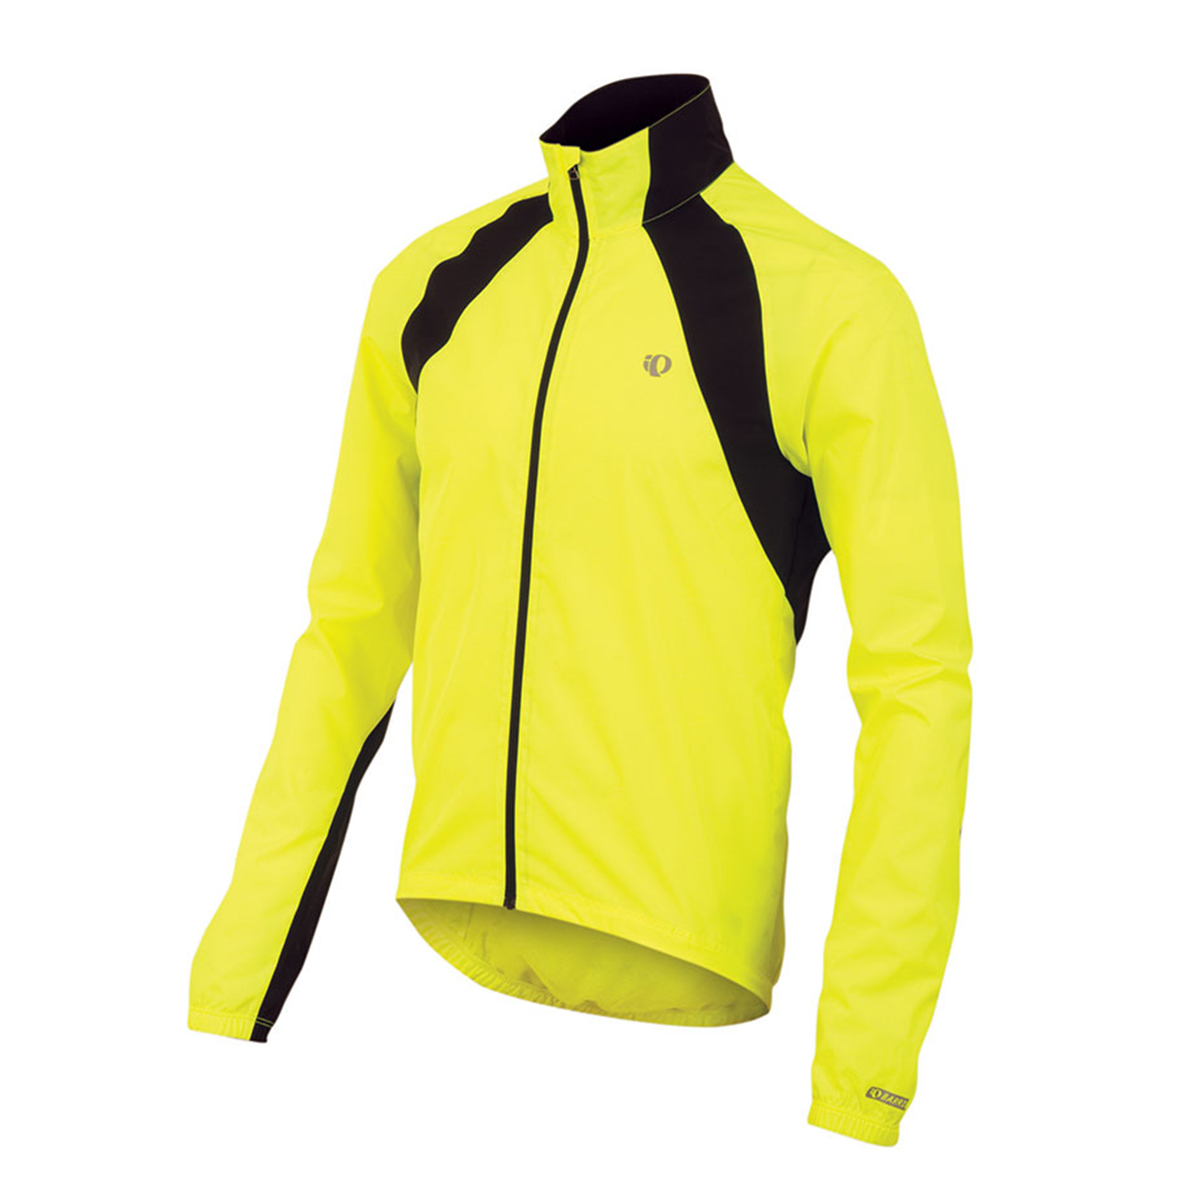 11131335428SSYL Pearl Izumi Select Barrier Jacket